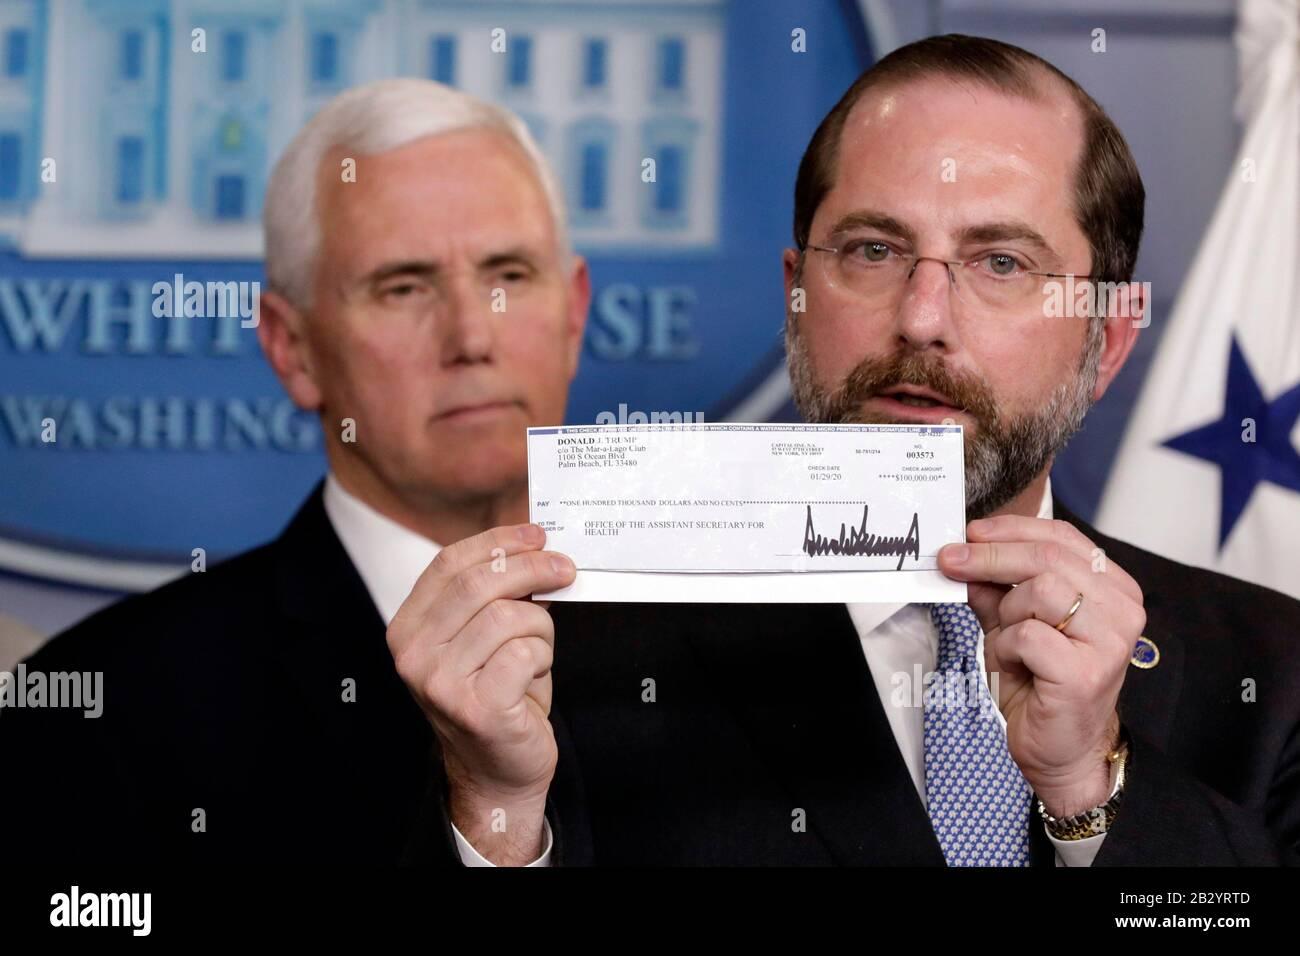 Washington United States Of America 03rd Mar 2020 U S Health And Human Services Hhs Secretary Alex